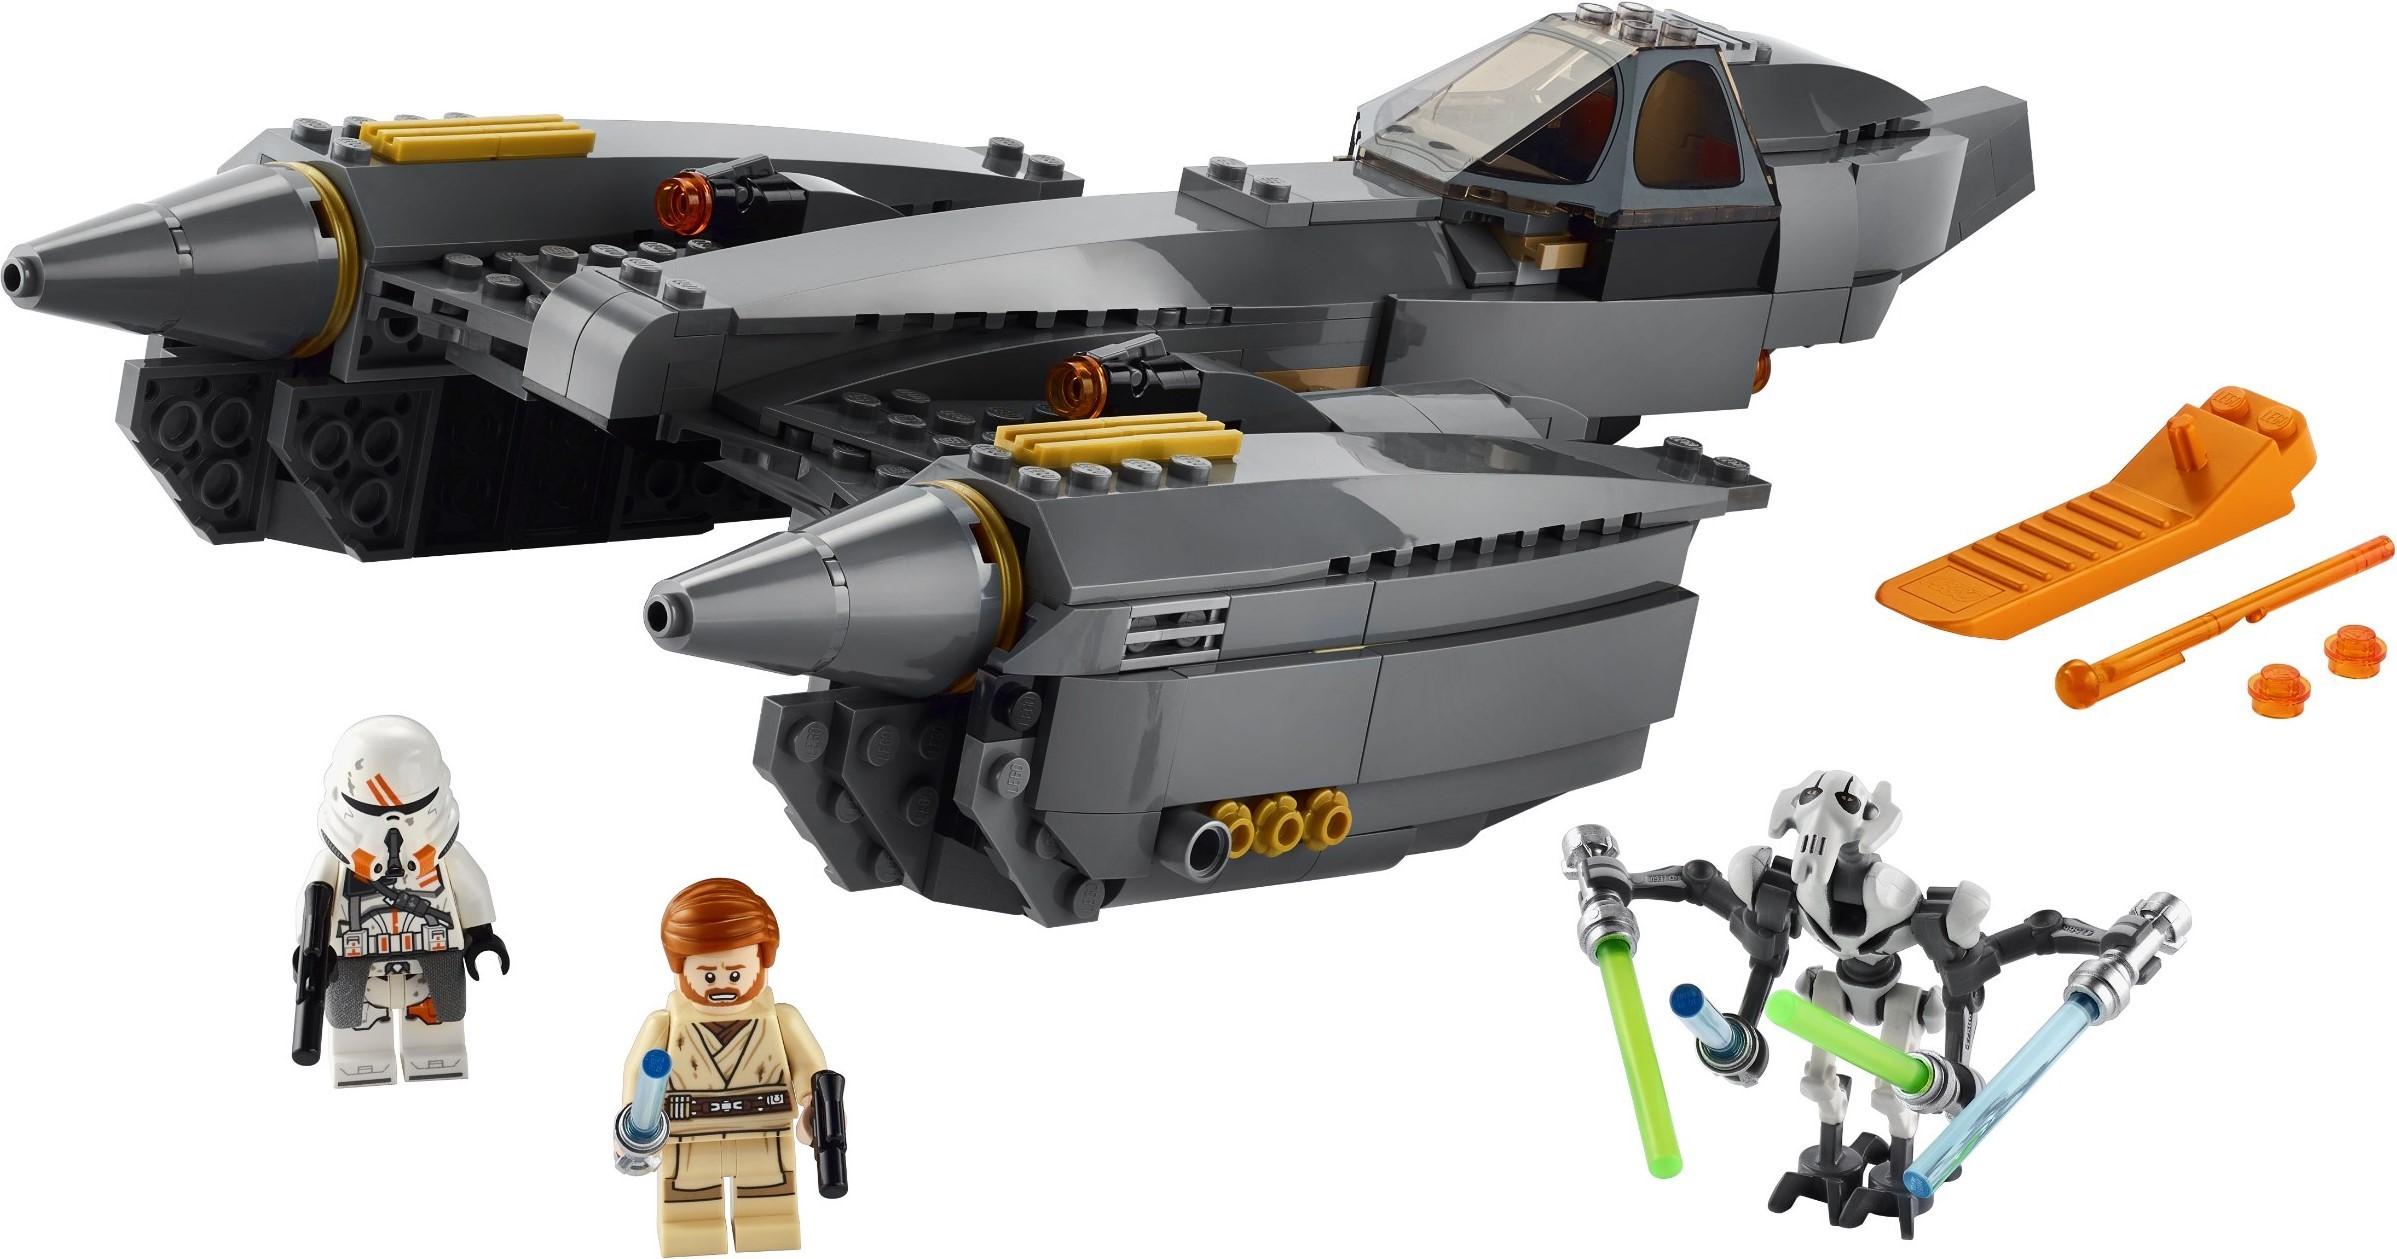 lego star wars 2020 general grievous's starfighter